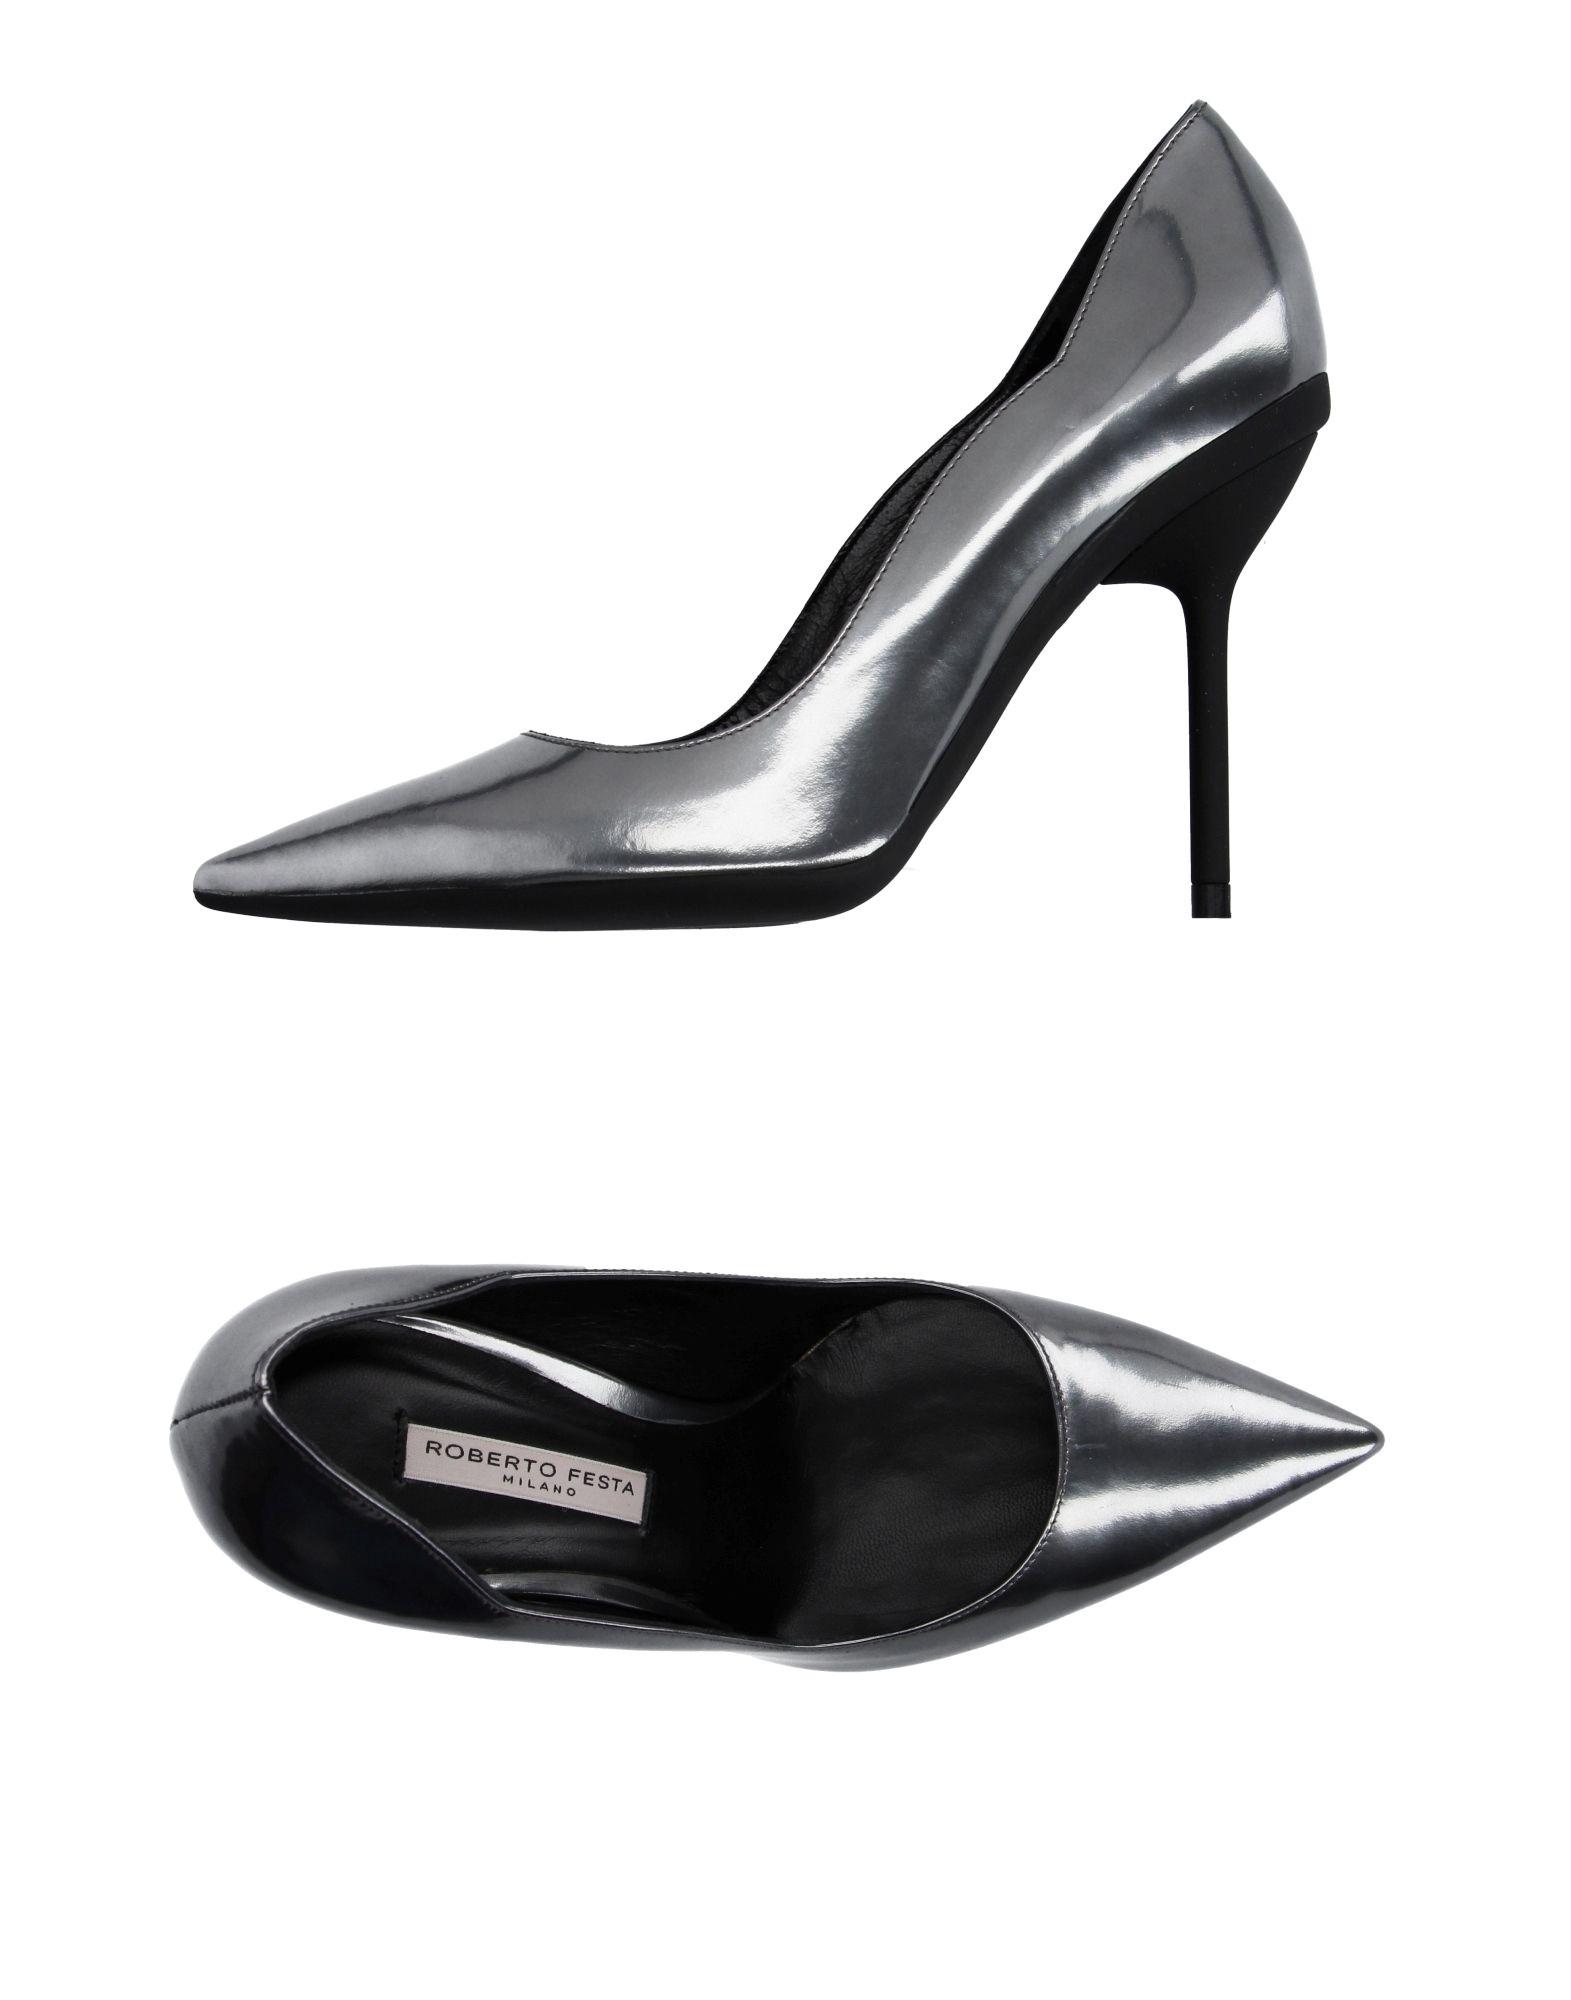 Sandali Peserico Donna - scarpe 11540171MT Nuove offerte e scarpe - comode 5940fb